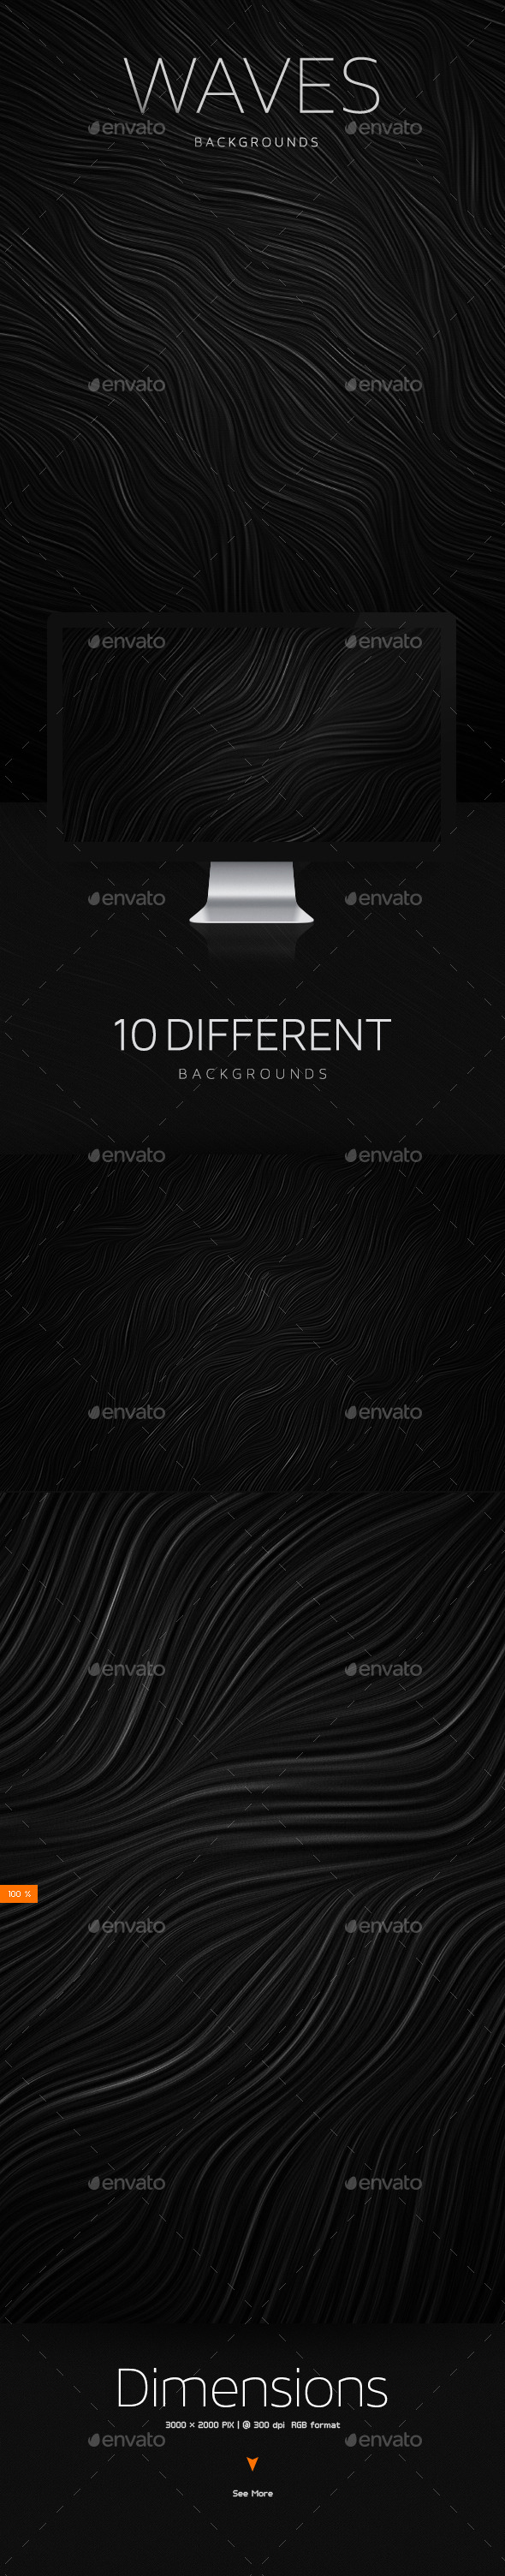 Waves Subtle Textures Backgrounds - Patterns Backgrounds